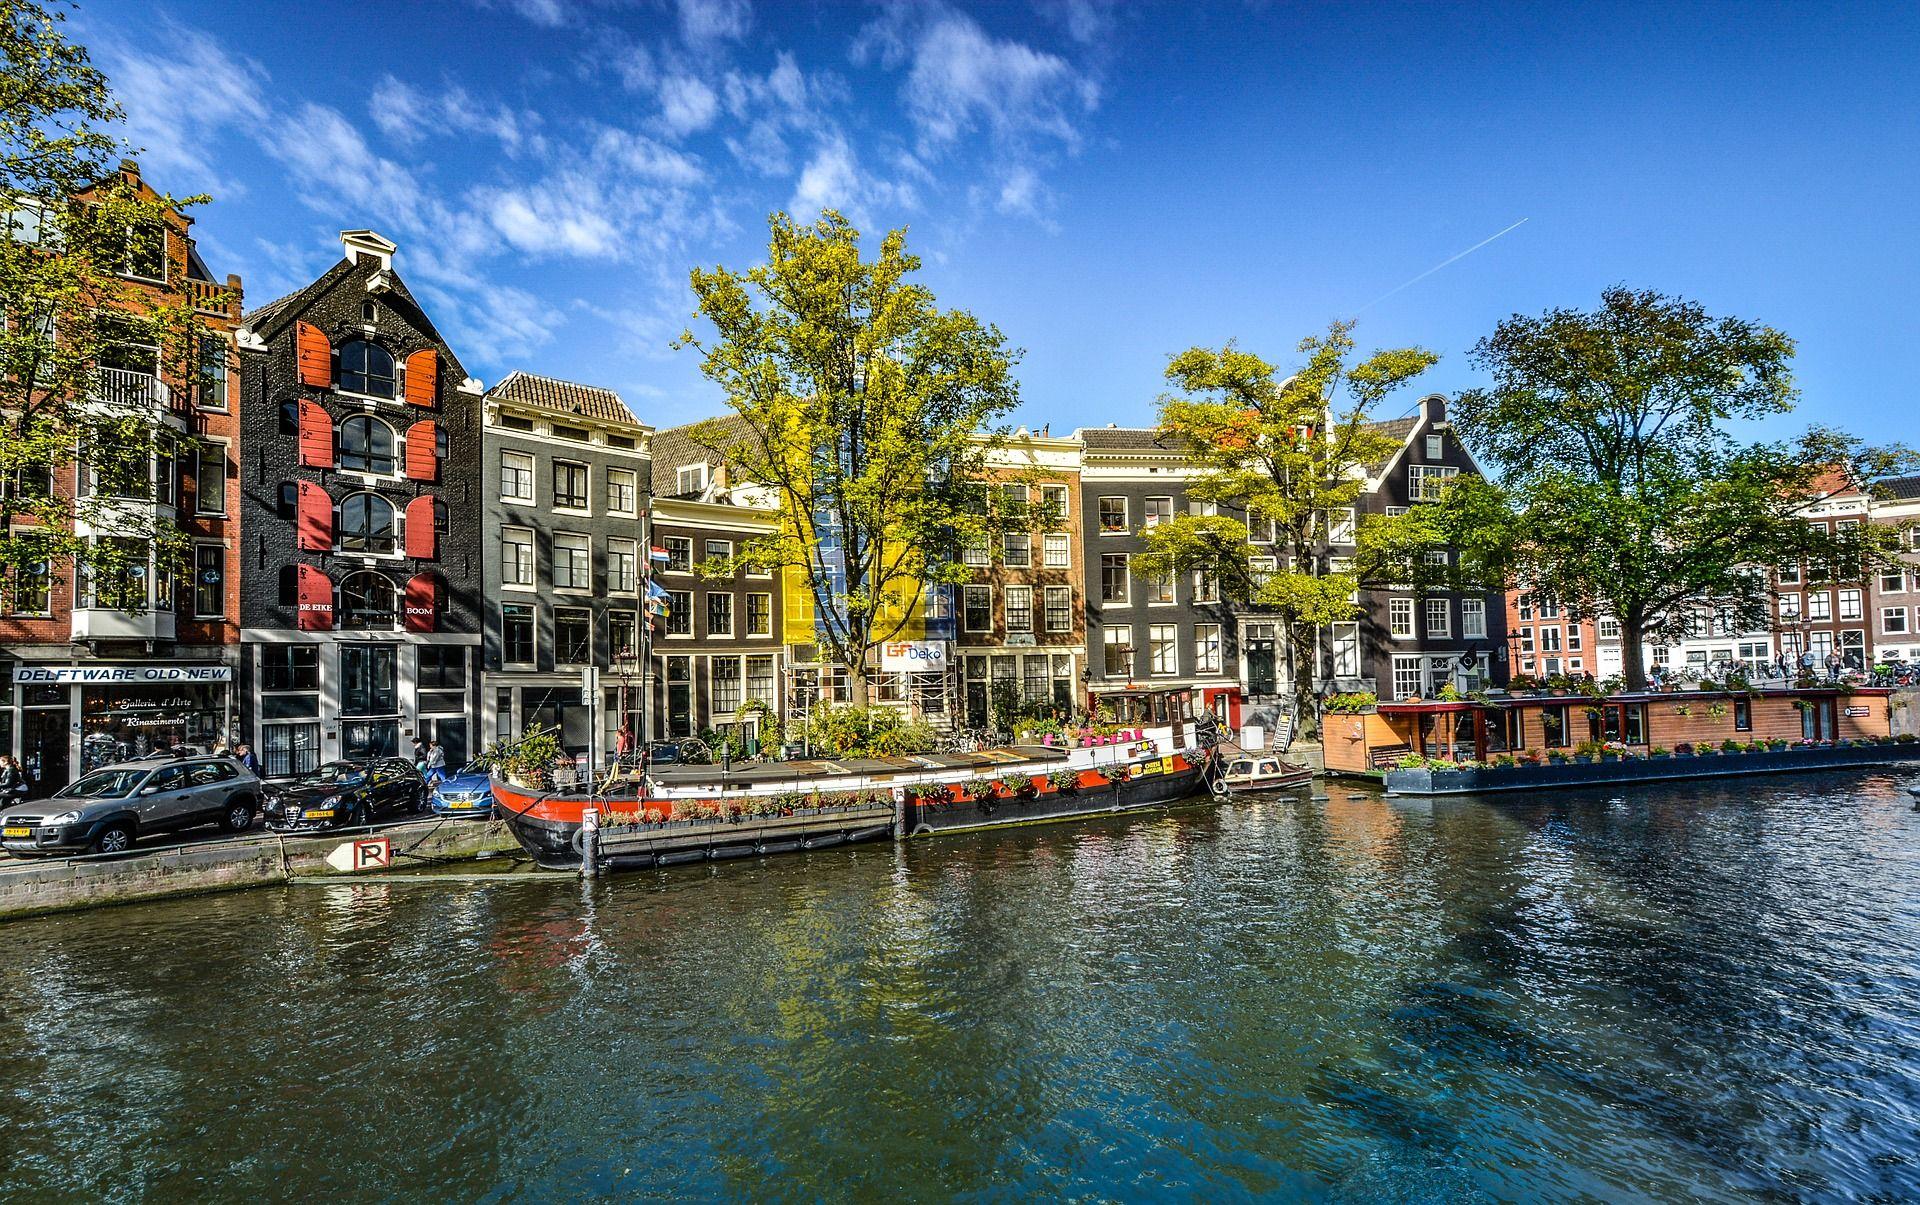 AMSTERDAM – HOD U KLOMPAMA